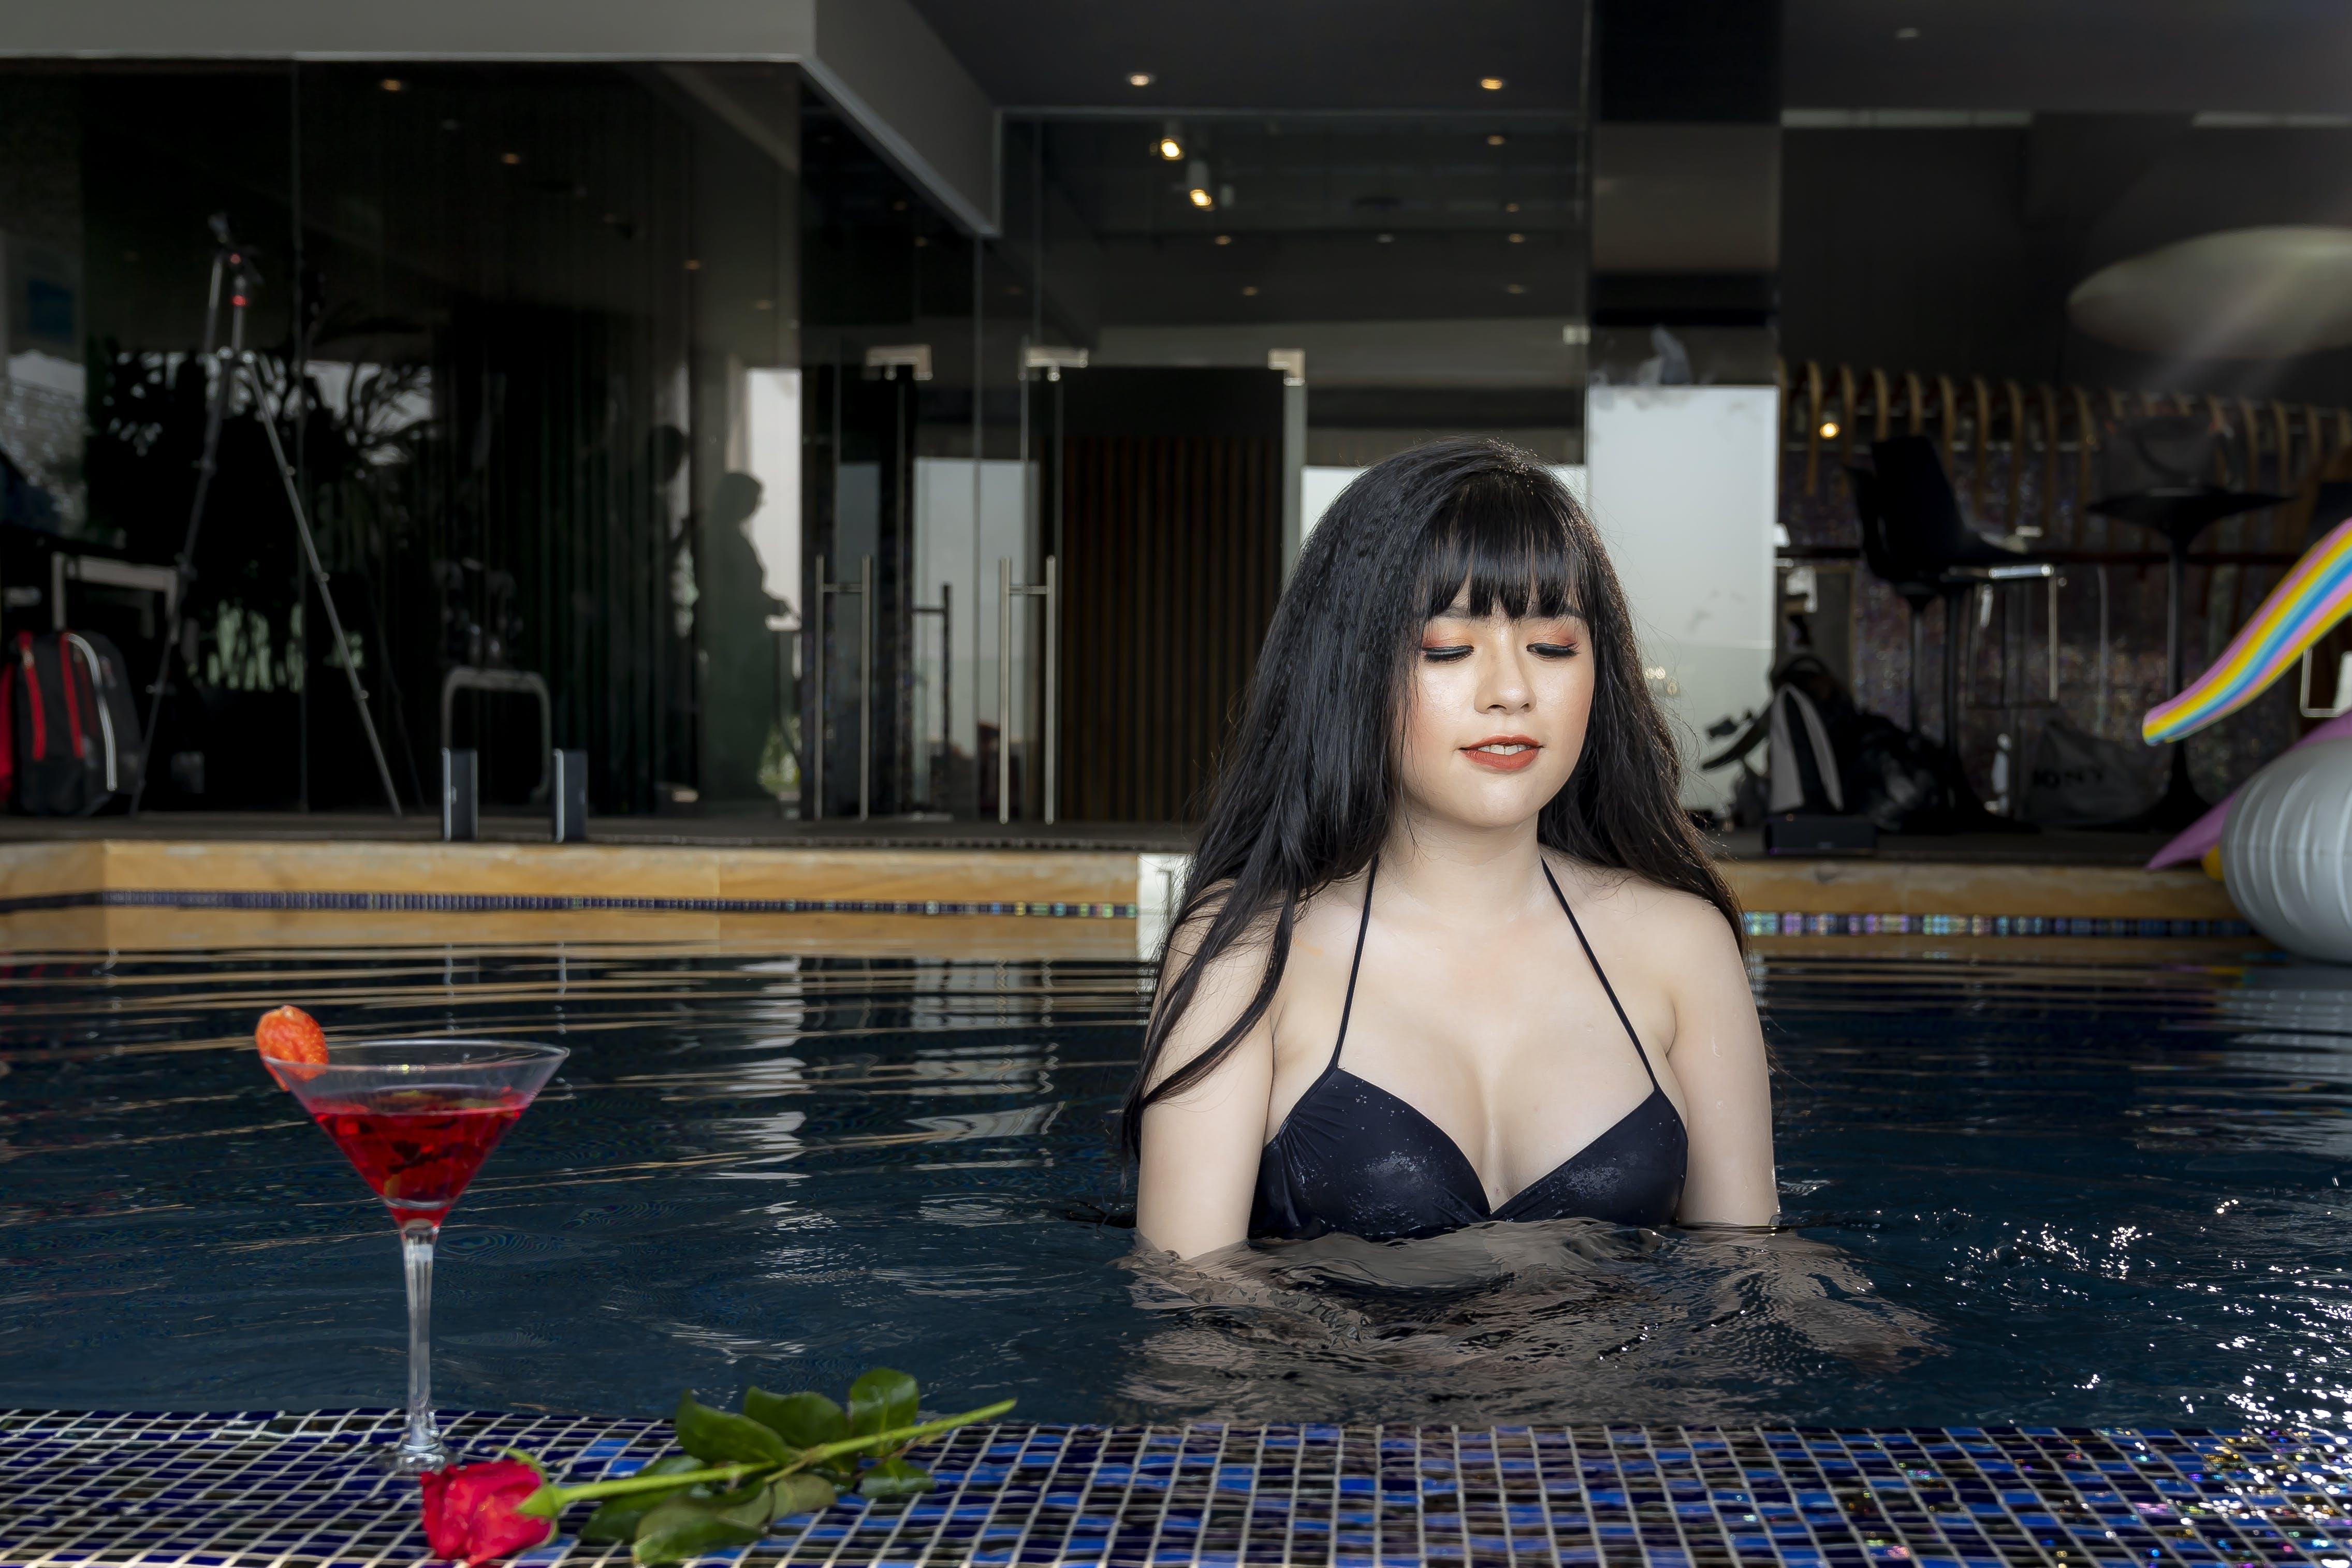 Woman Wearing Black Bikini Top on Swimming Pool Near Glass of Wine and Red Rose Flower